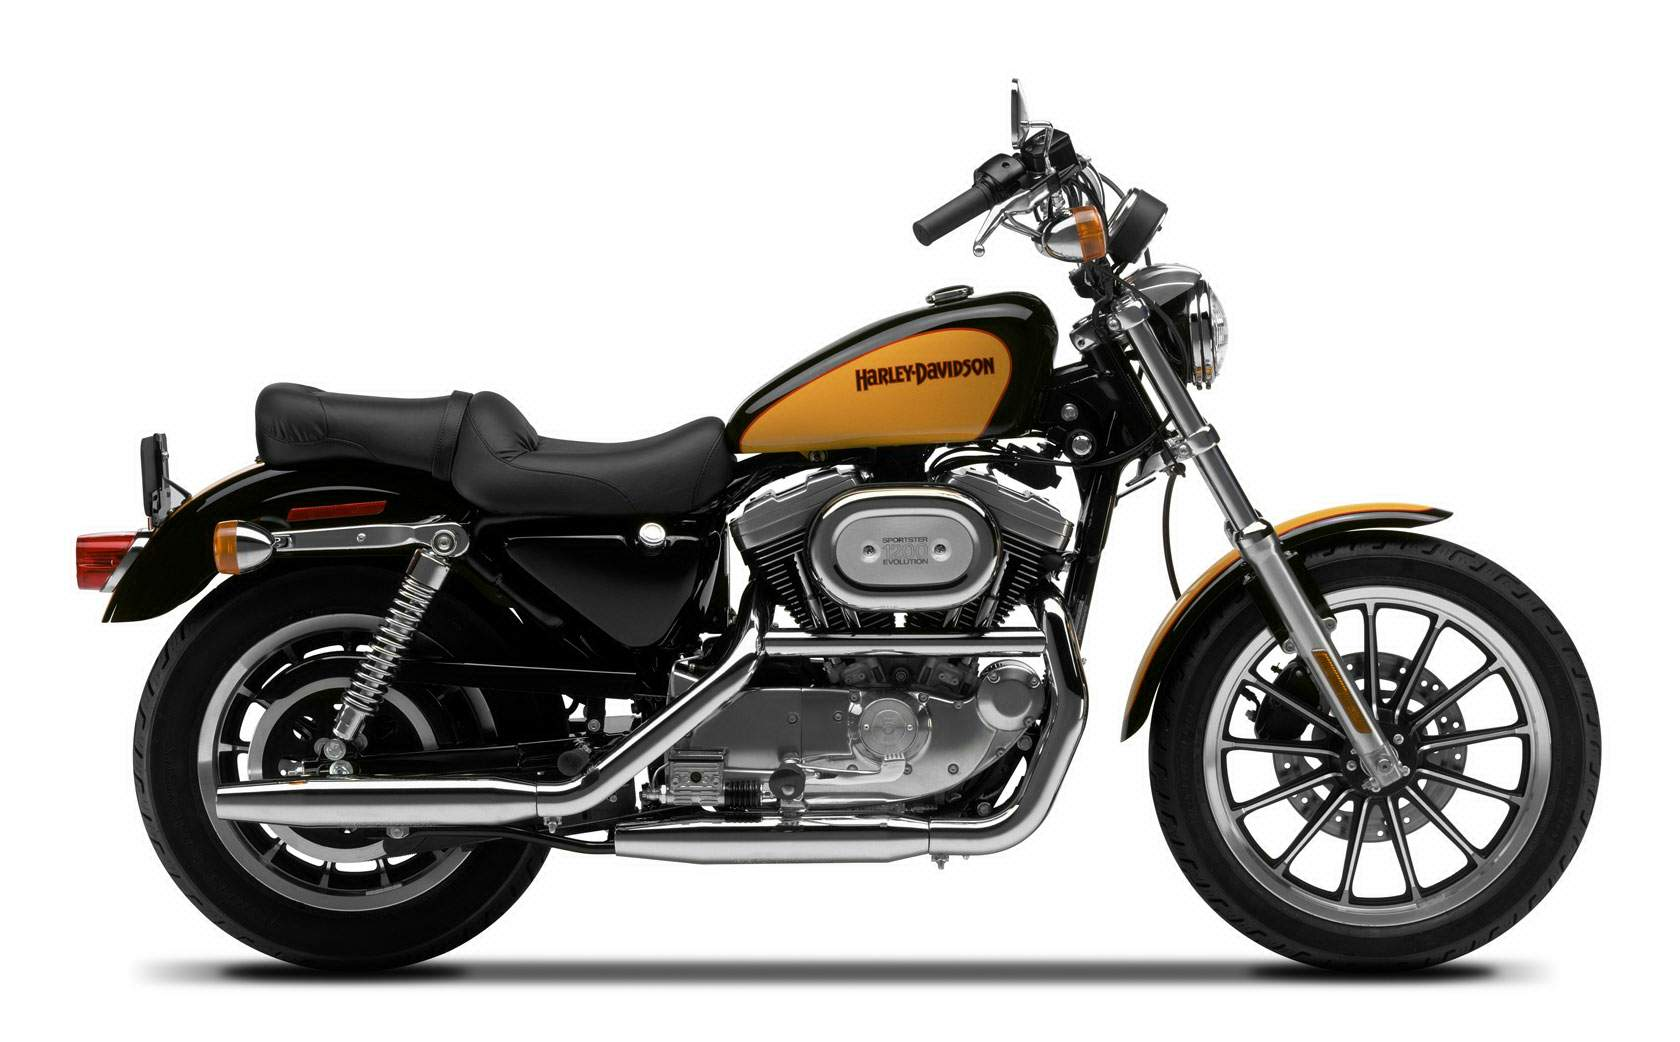 Harley-Davidson Motorcycle Manuals Online